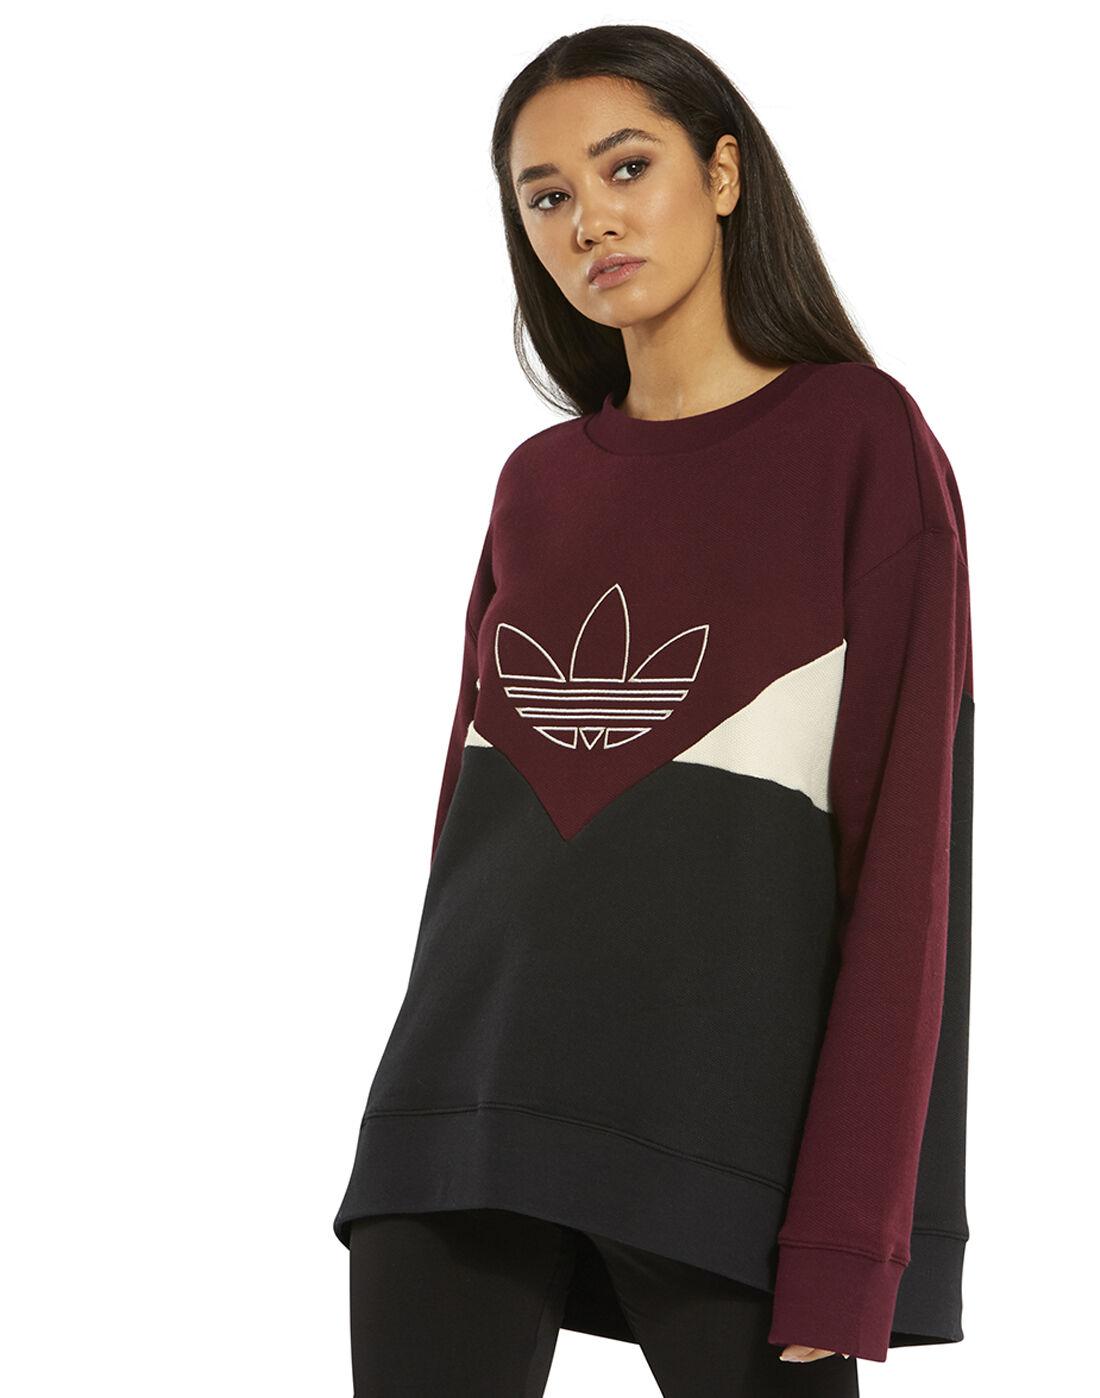 ADIDAS ORIGINALS Sweatshirt 'CLRDO SWEATSHIRT' in schwarz